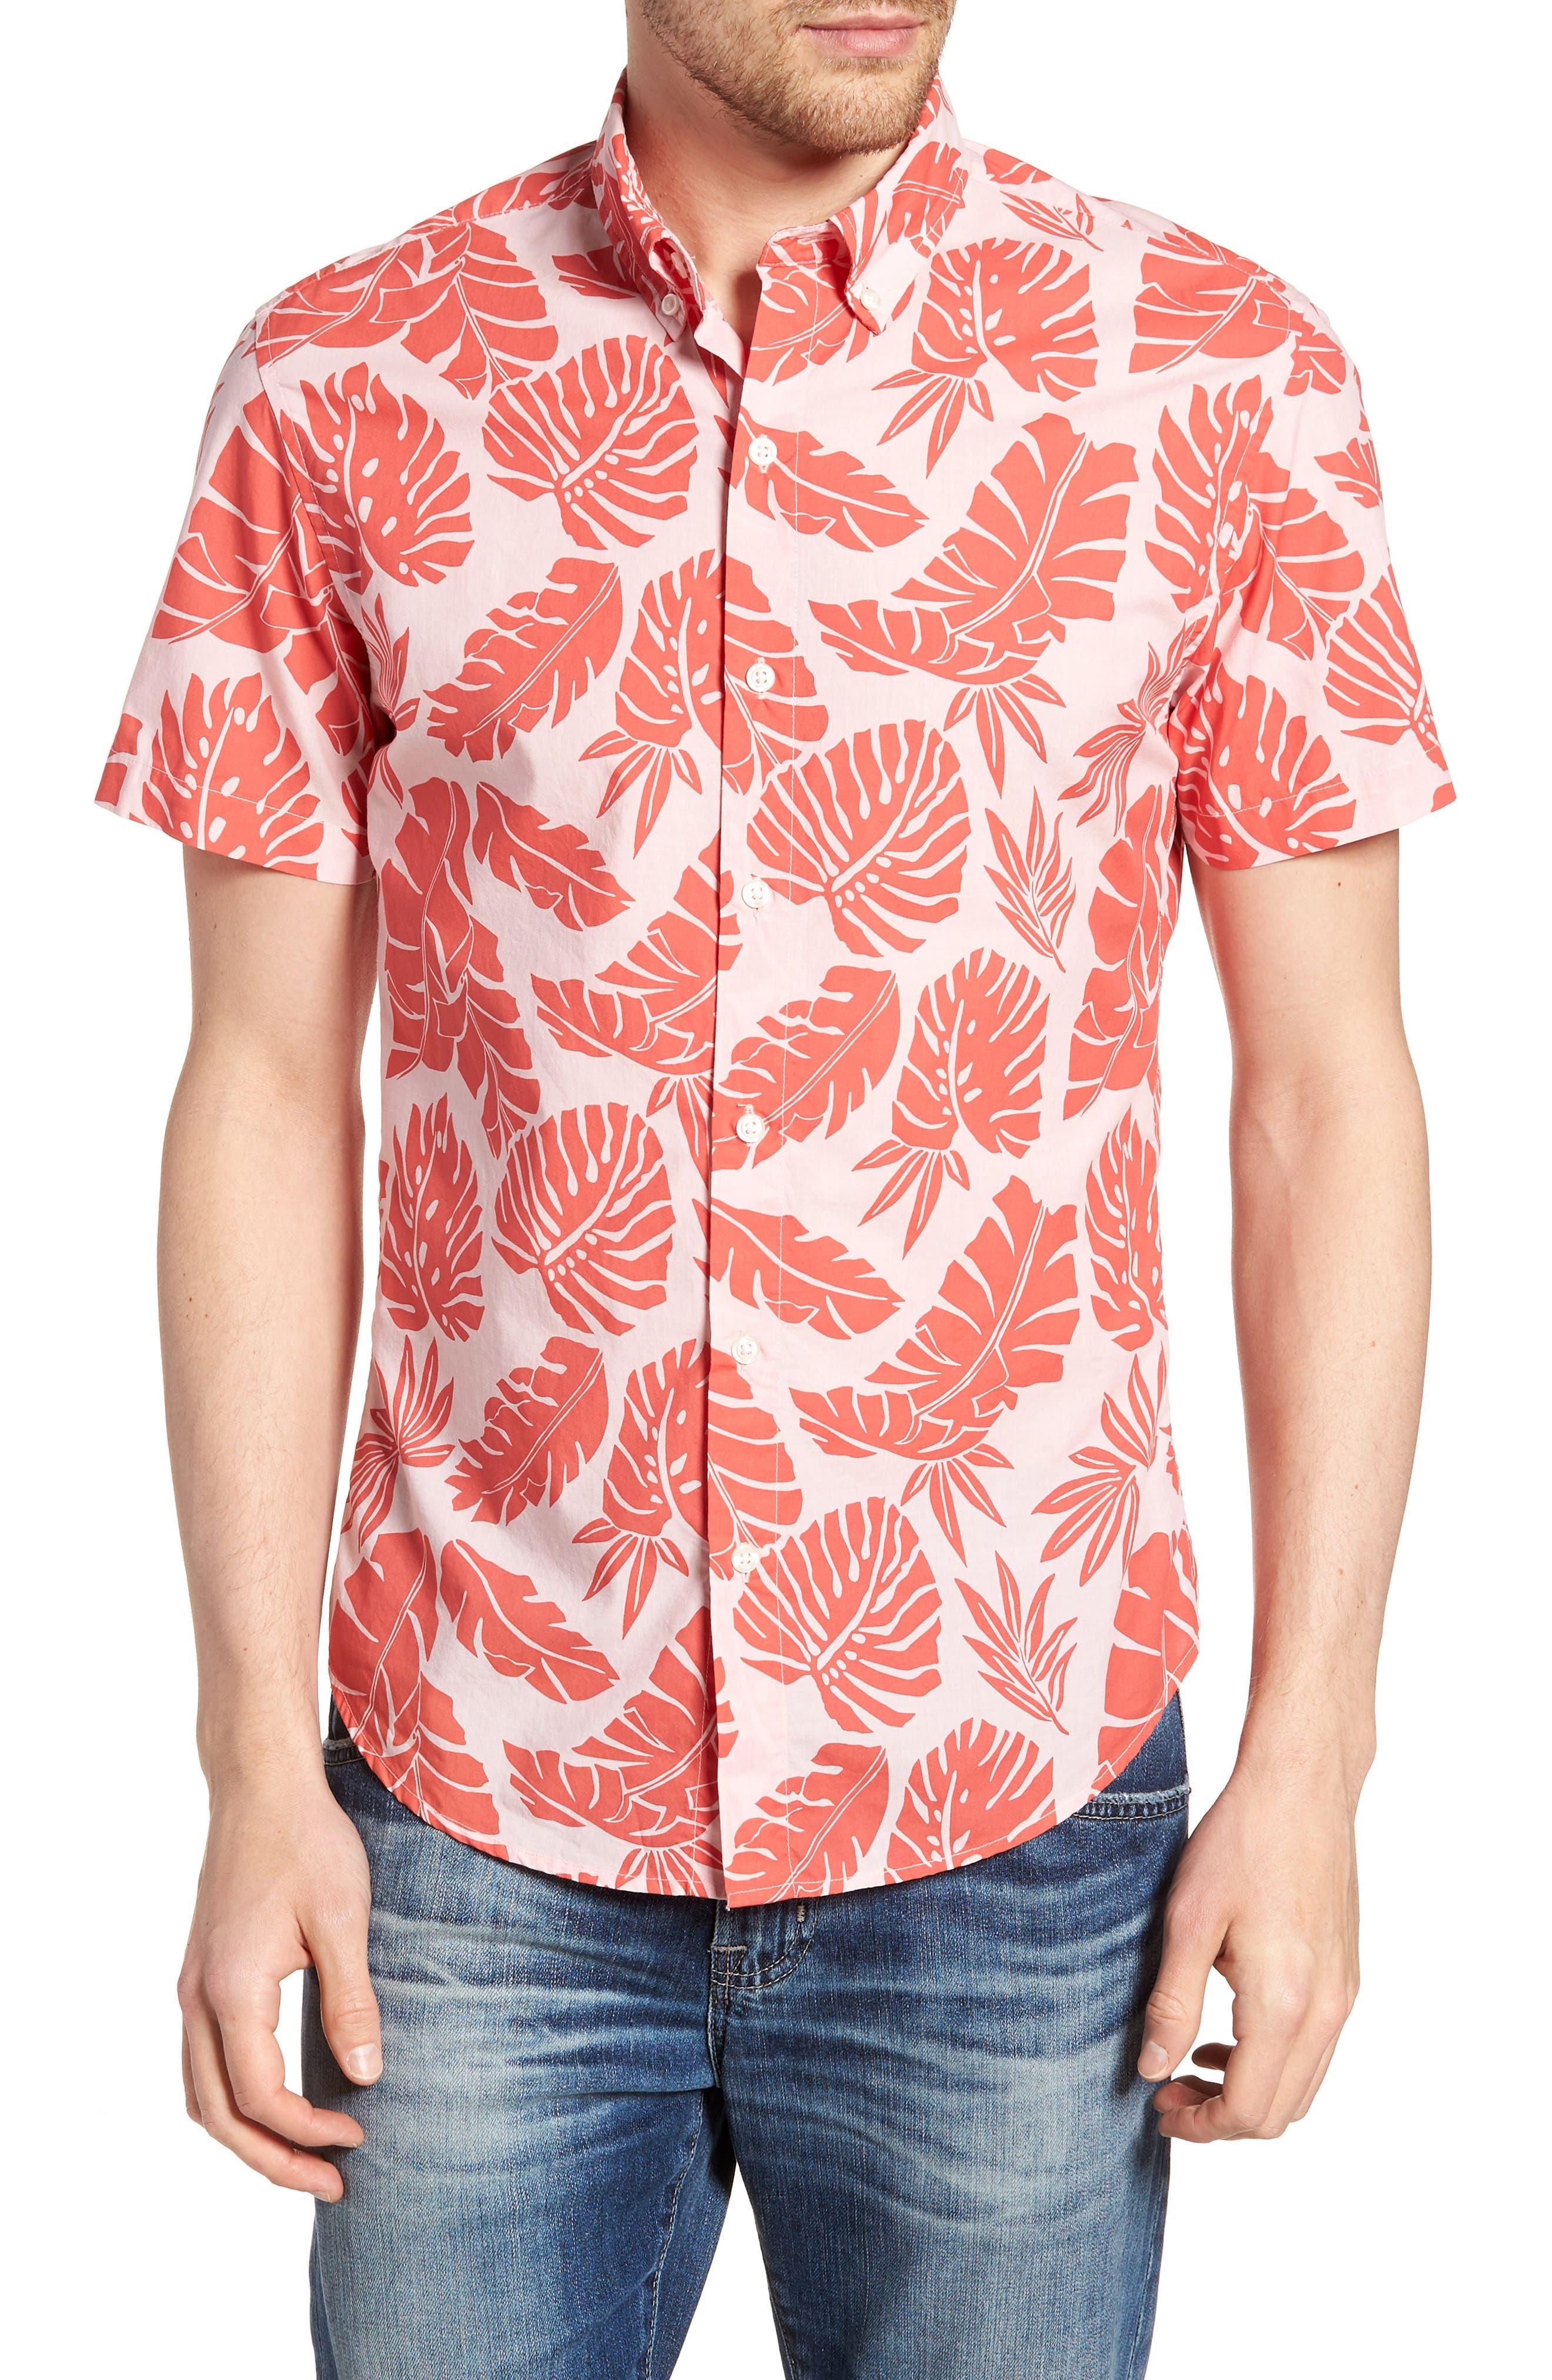 Riviera Slim Fit Palm Print Sport Shirt,                         Main,                         color, PALM SCATTER - CORAL FAN